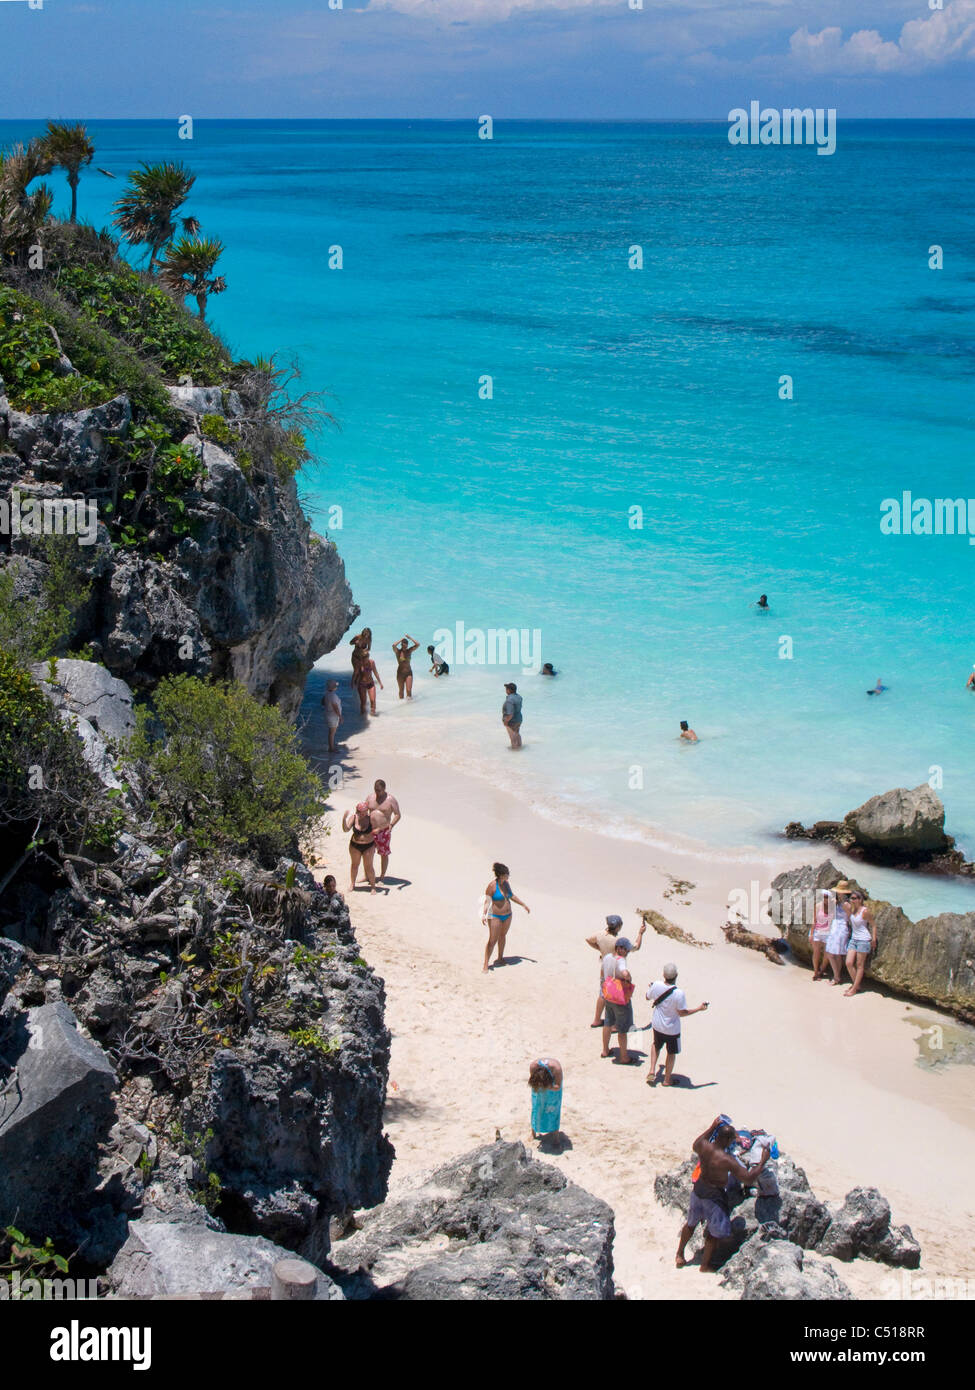 Strand bei den Mayastaetten von Tulum Quintana Roo, Yukatan, Mexiko,  Beach at the Tulum ruins, Yucatan, Mexico - Stock Image